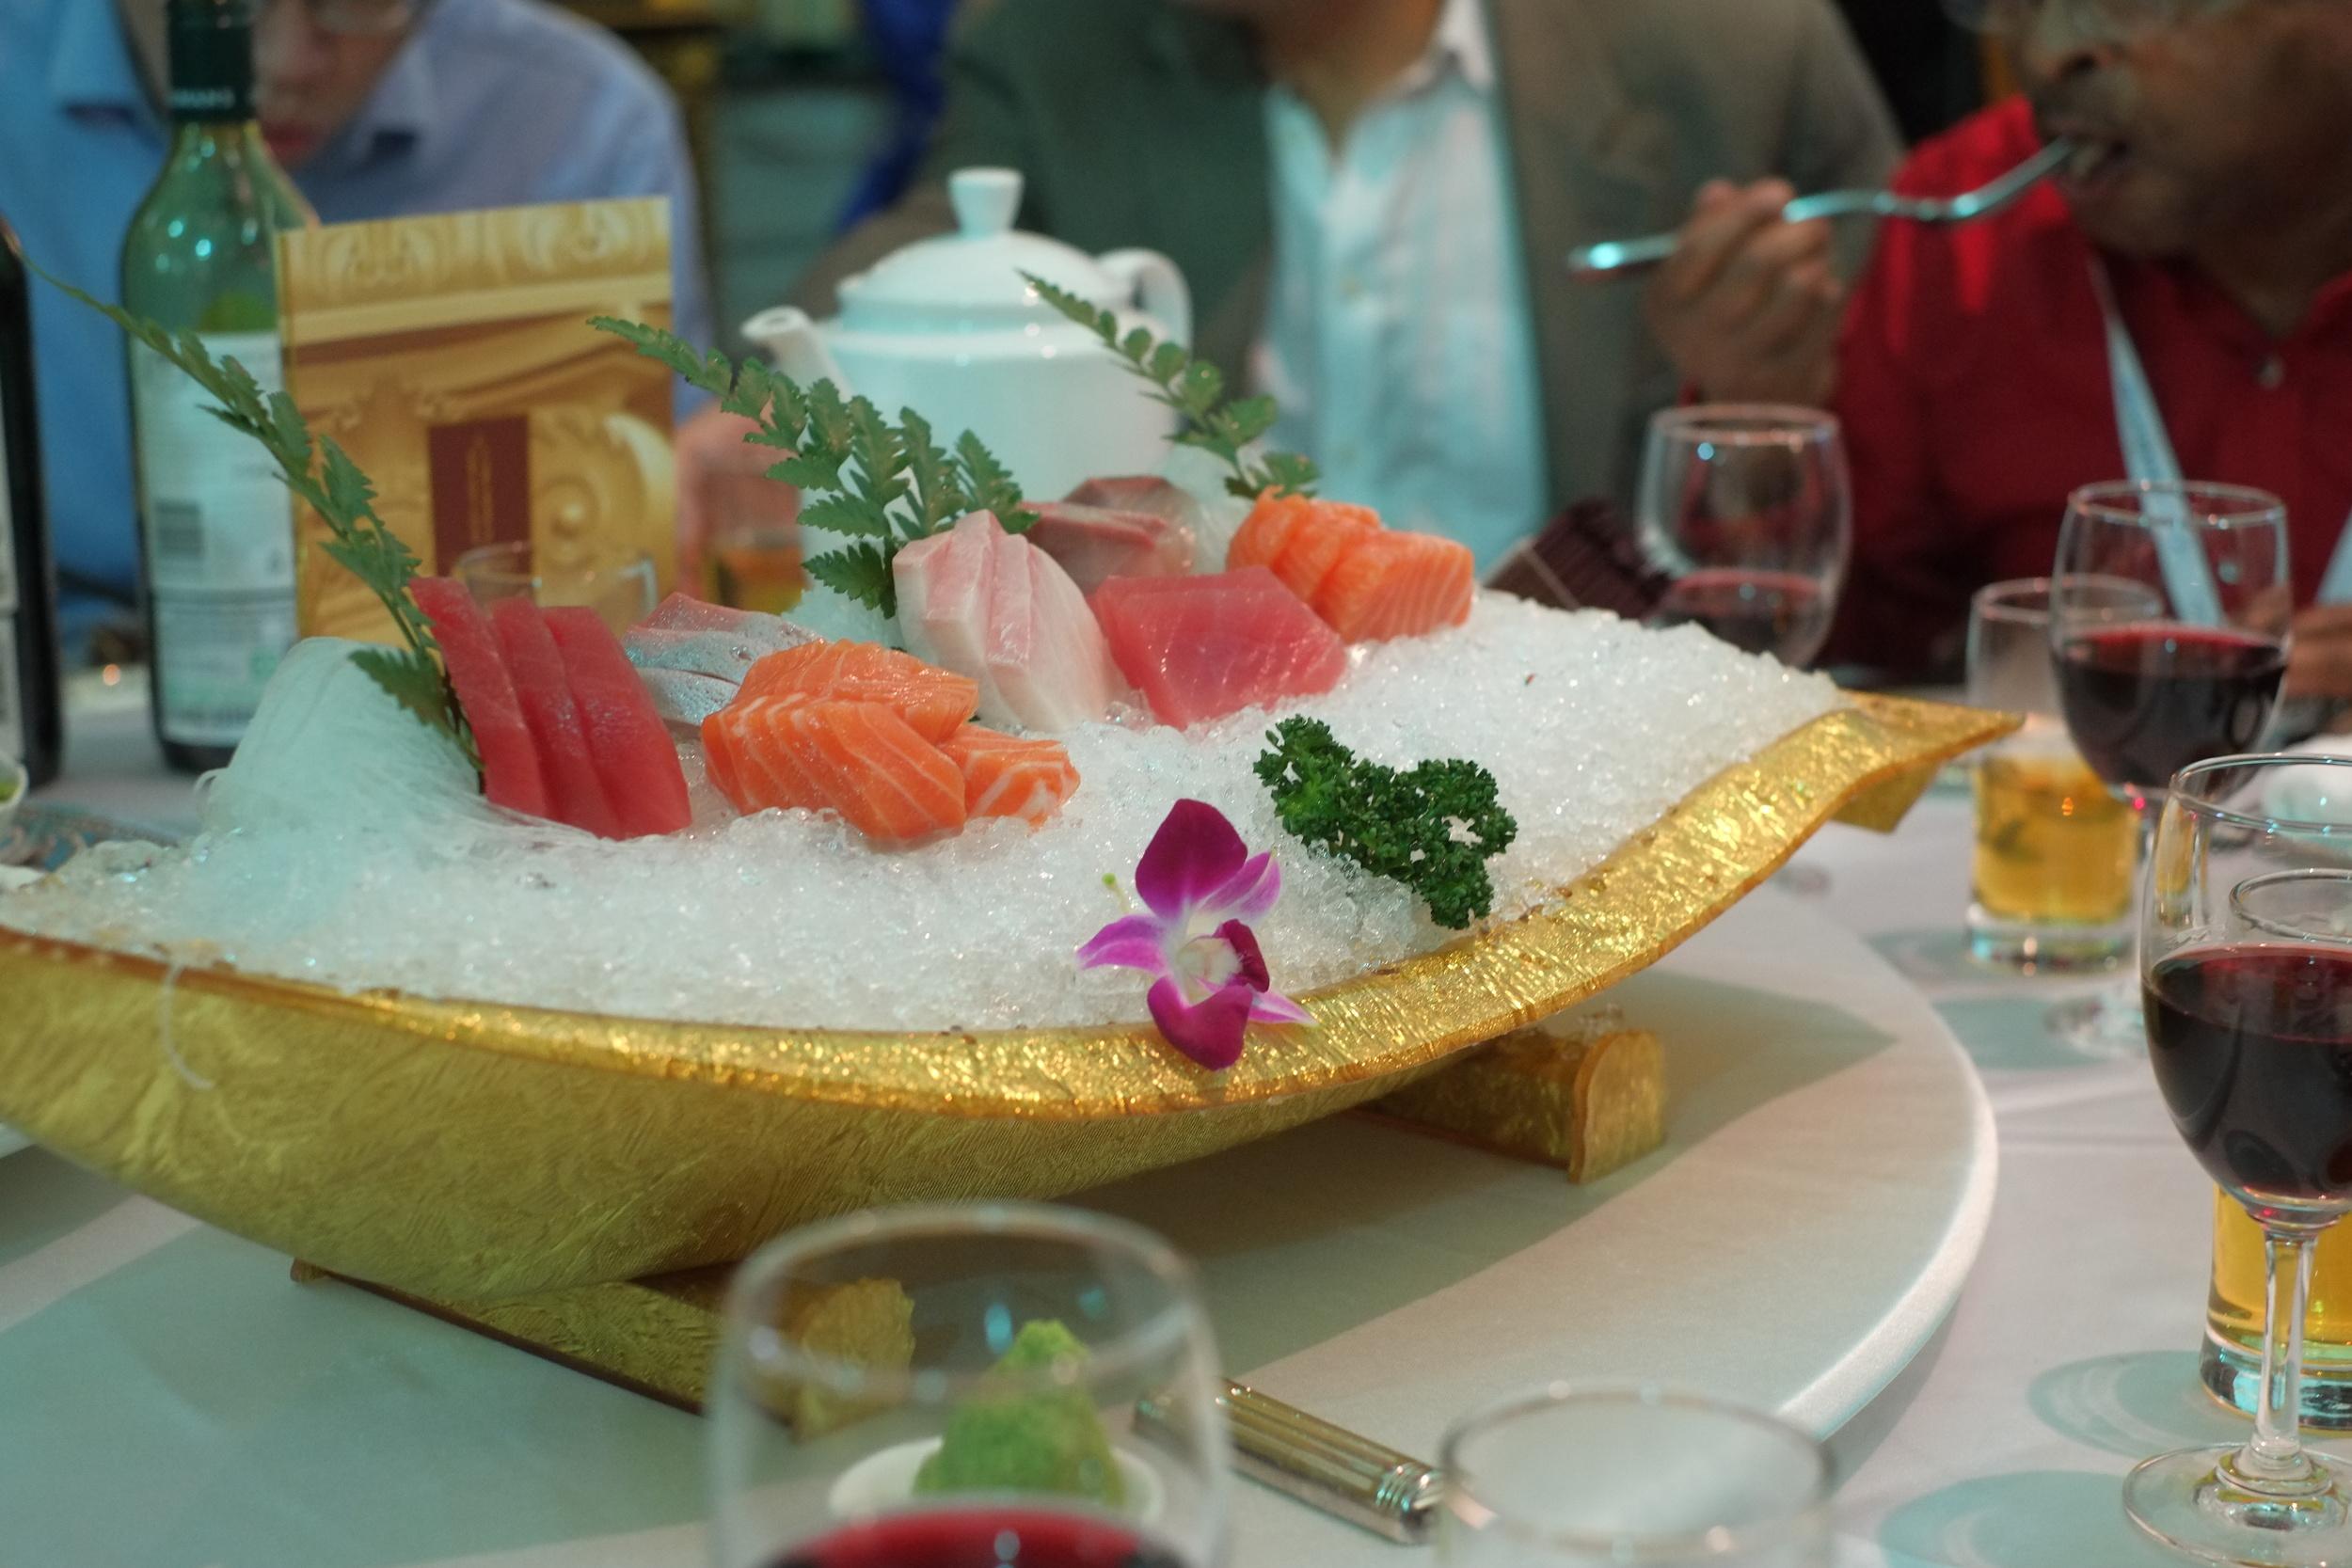 Cryo-Sashimi - food of the future